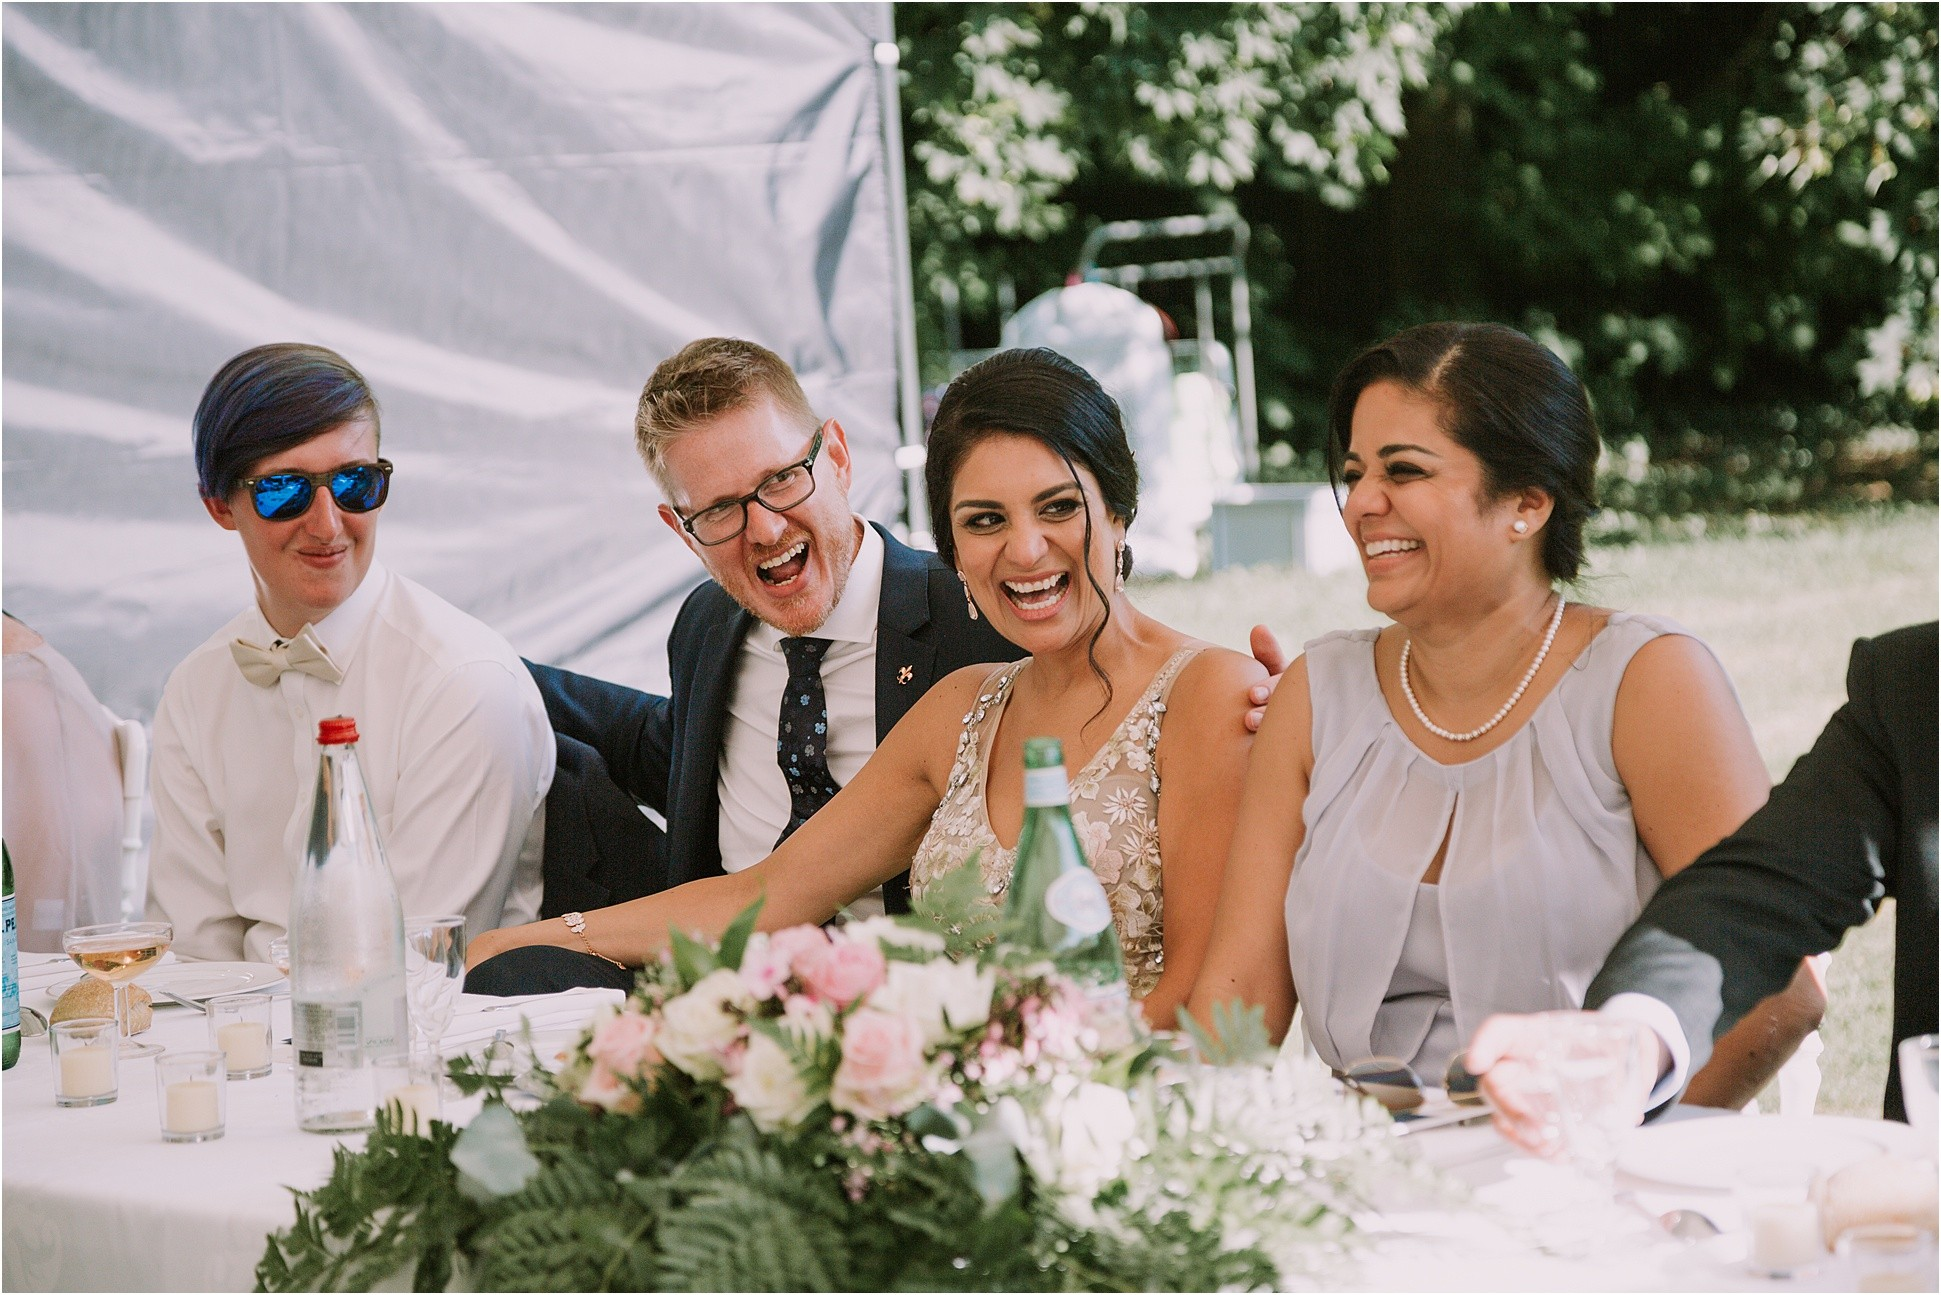 Kateryna-photos-photographe-mariage-chateau-st-paterne-mayenne-normandie_0155.jpg